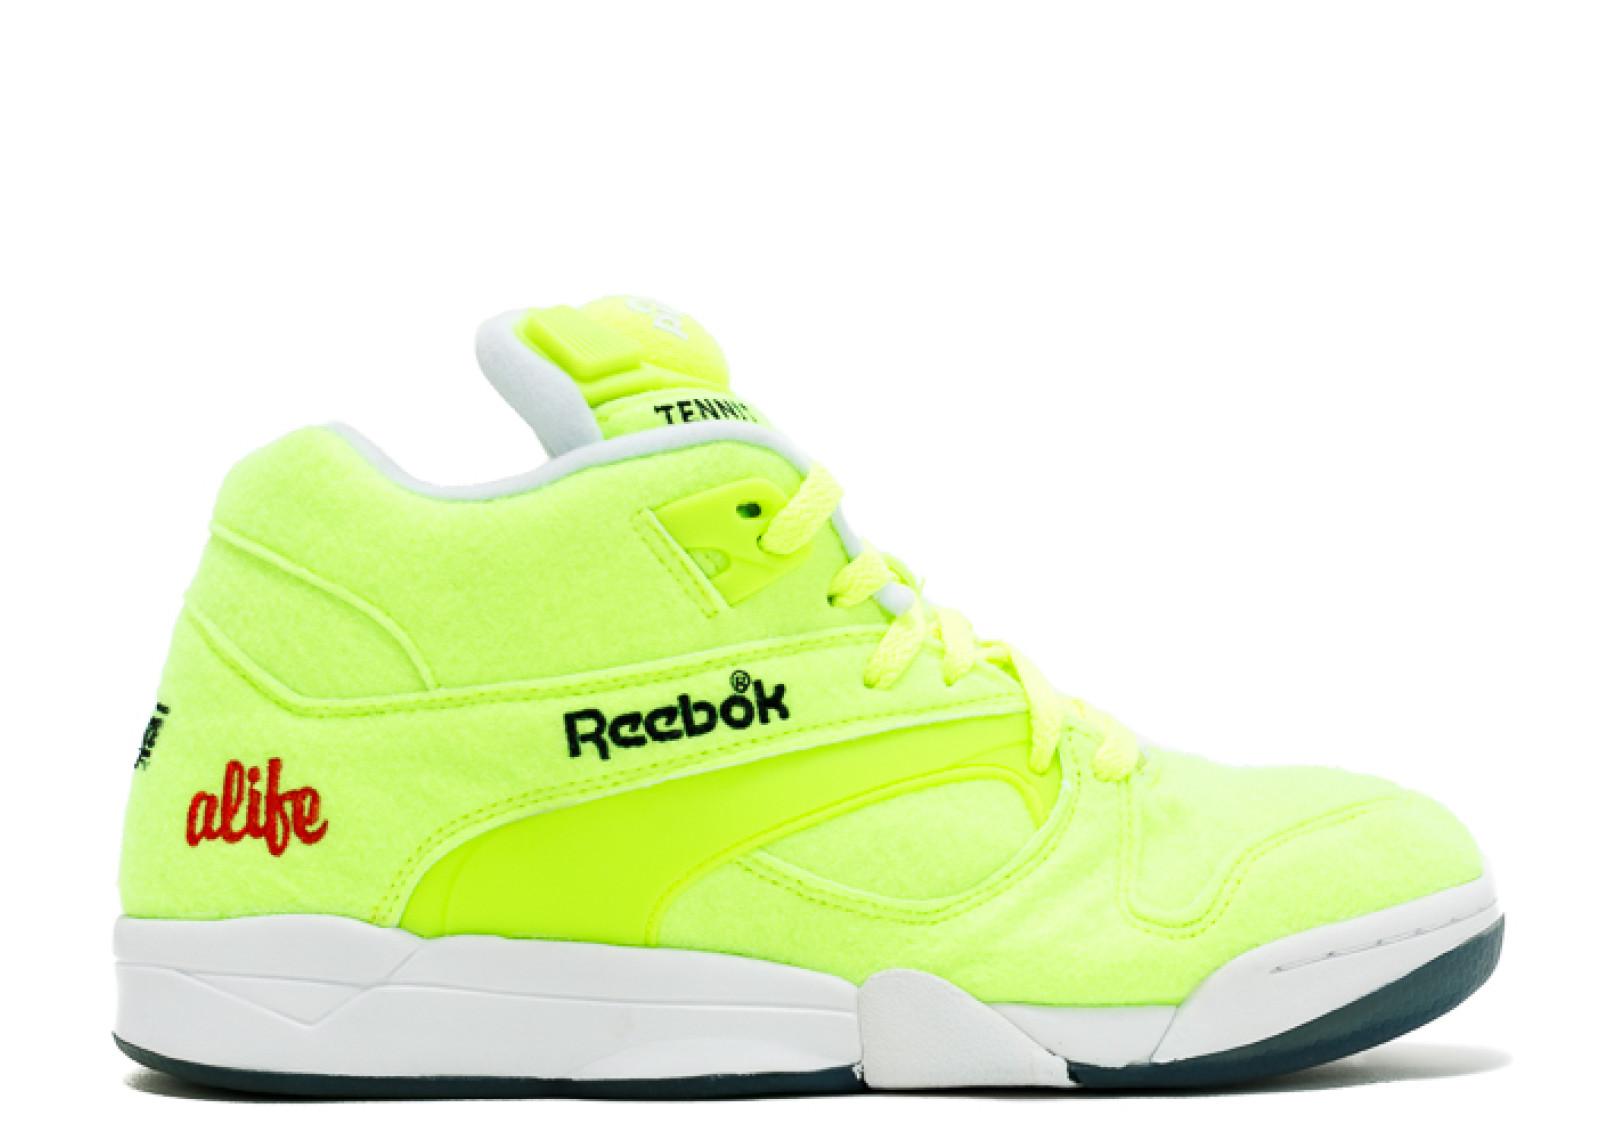 reebok pump yellow